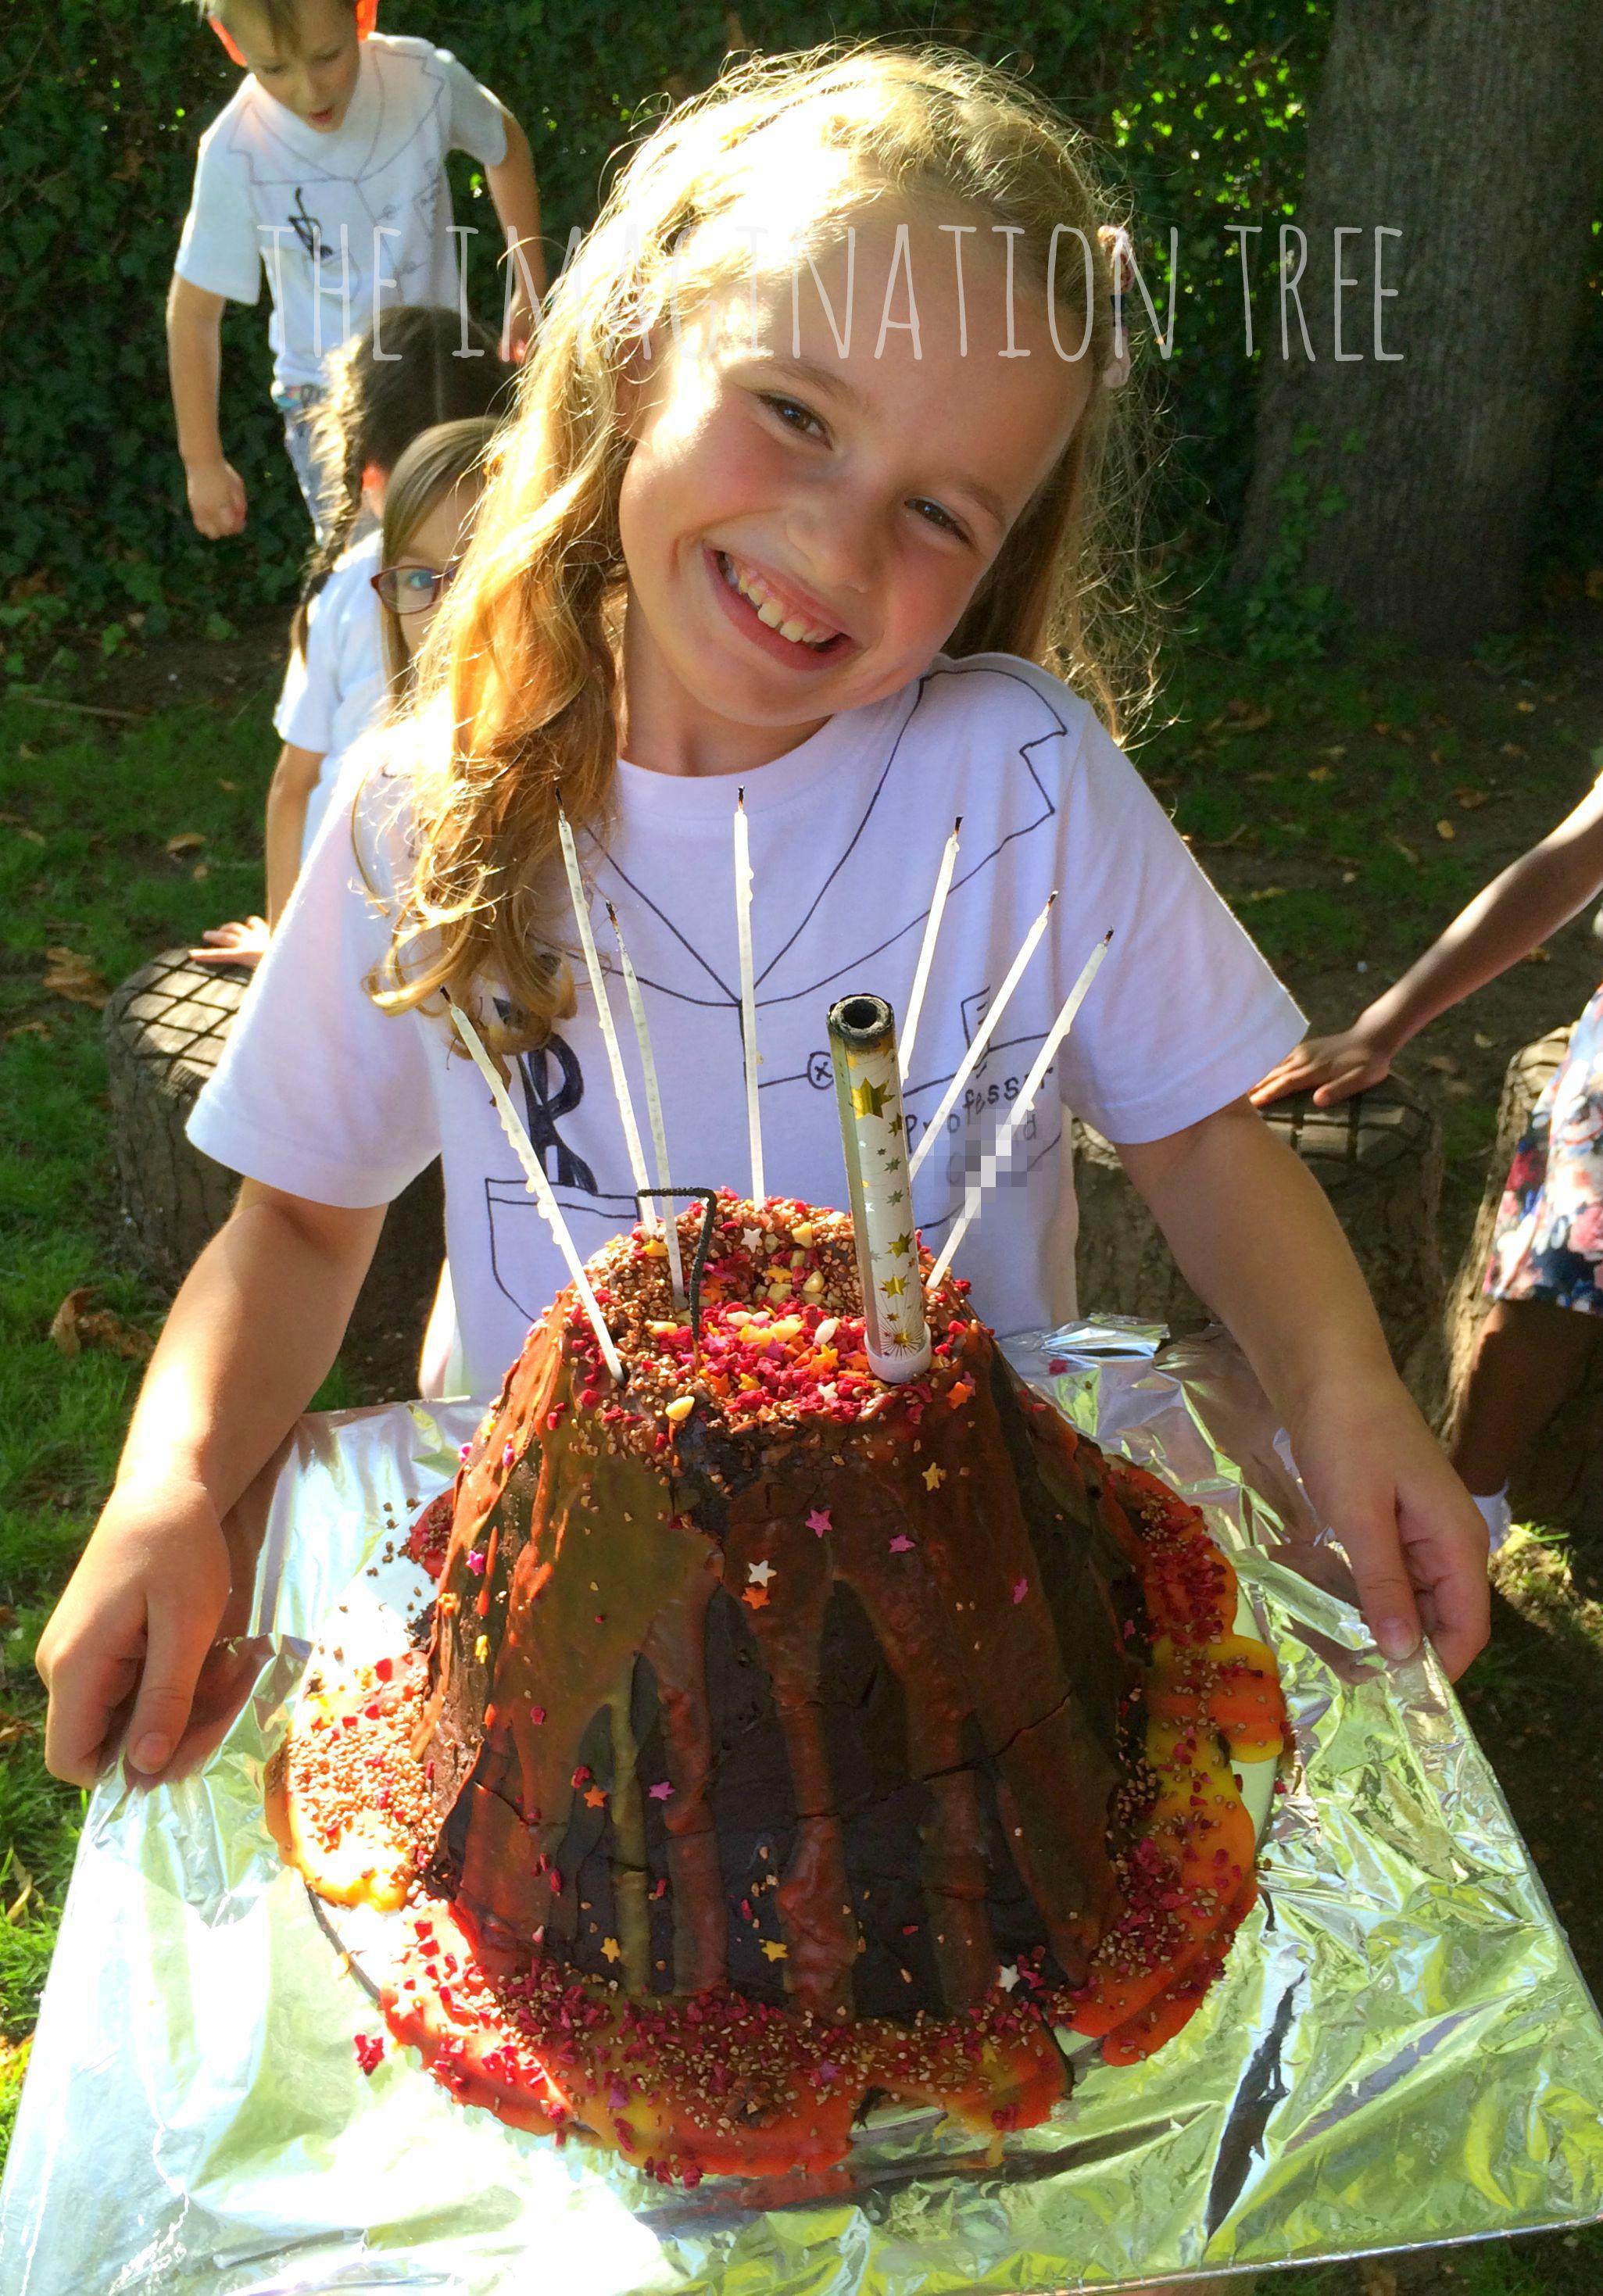 Volcano Piata Cake Recipe The Imagination Tree